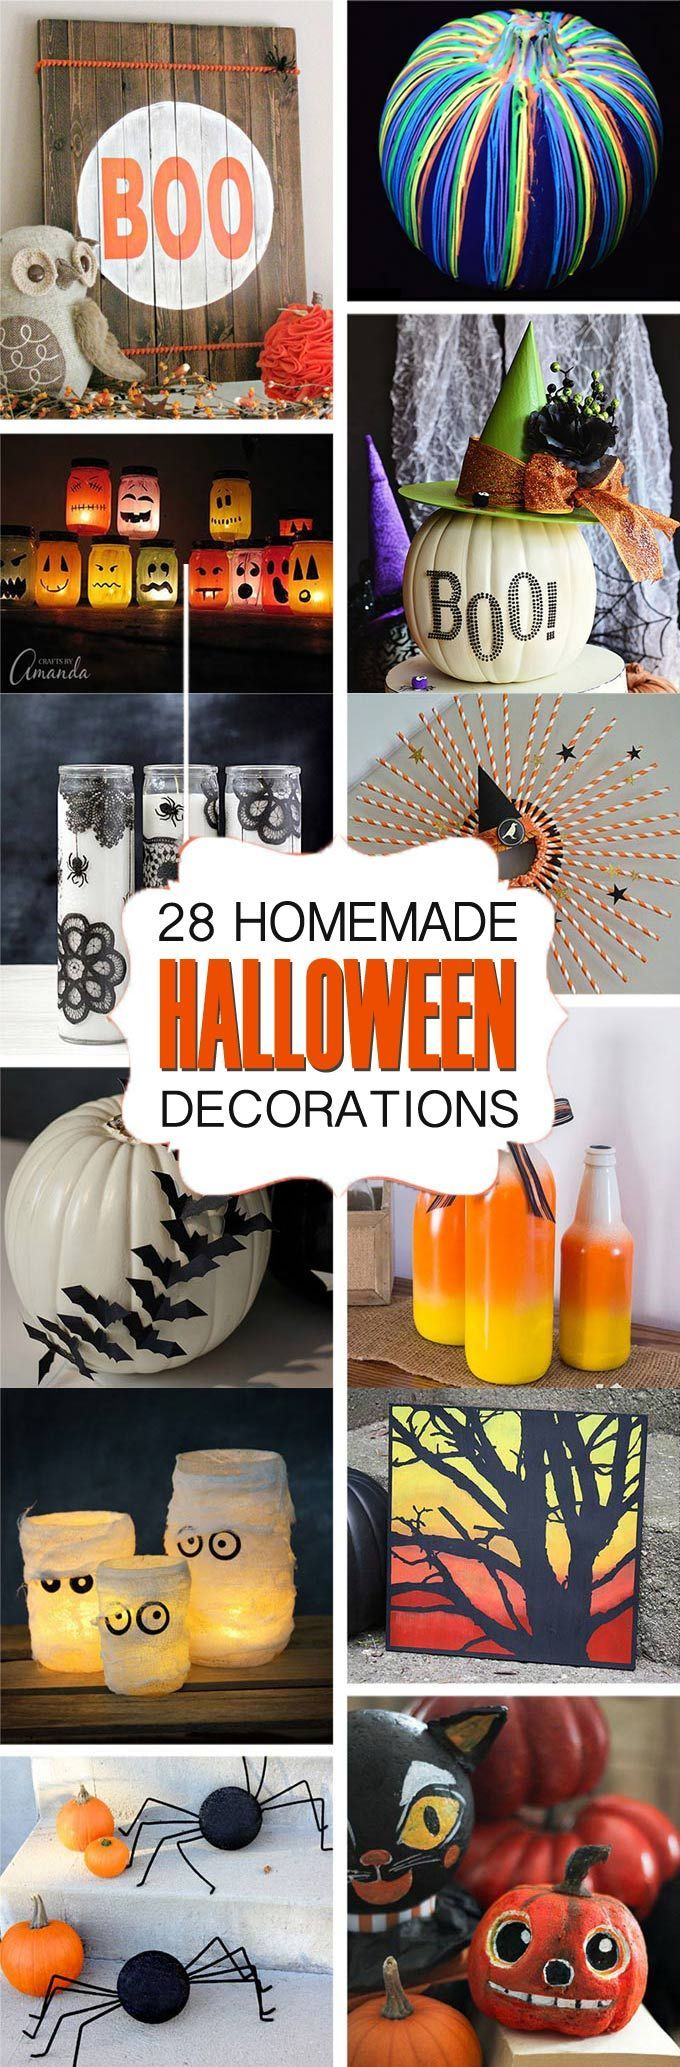 Best 25 wooden halloween decorations ideas on pinterest for Cheap diy indoor halloween decorations